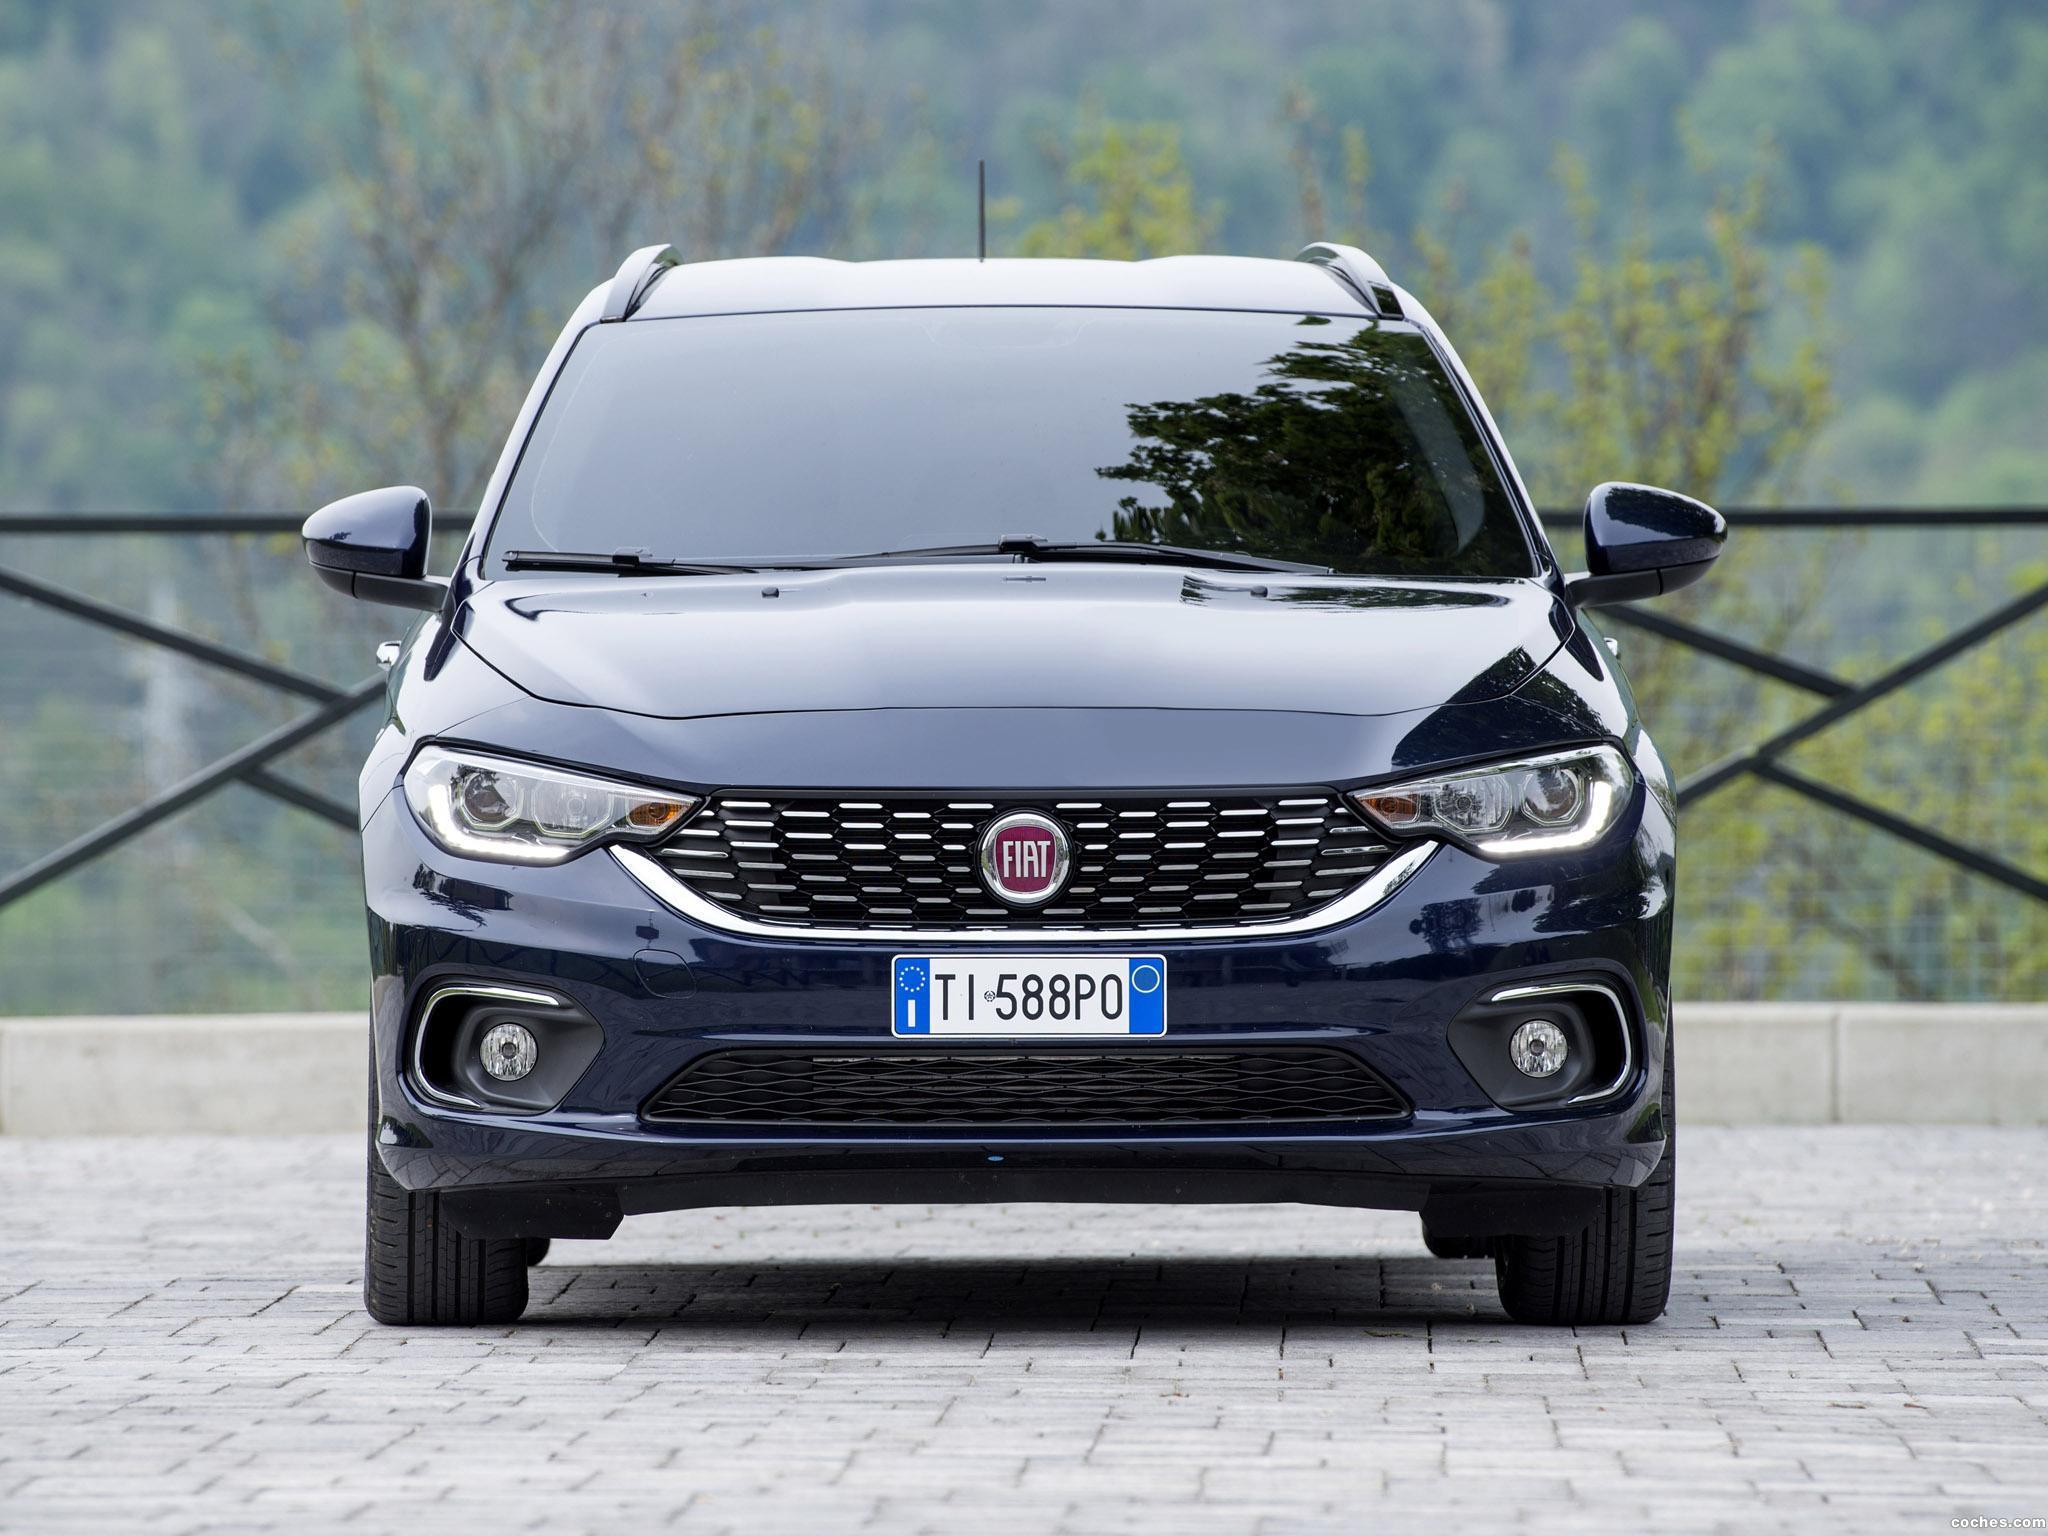 Foto 26 de Fiat Tipo Station Wagon 2016